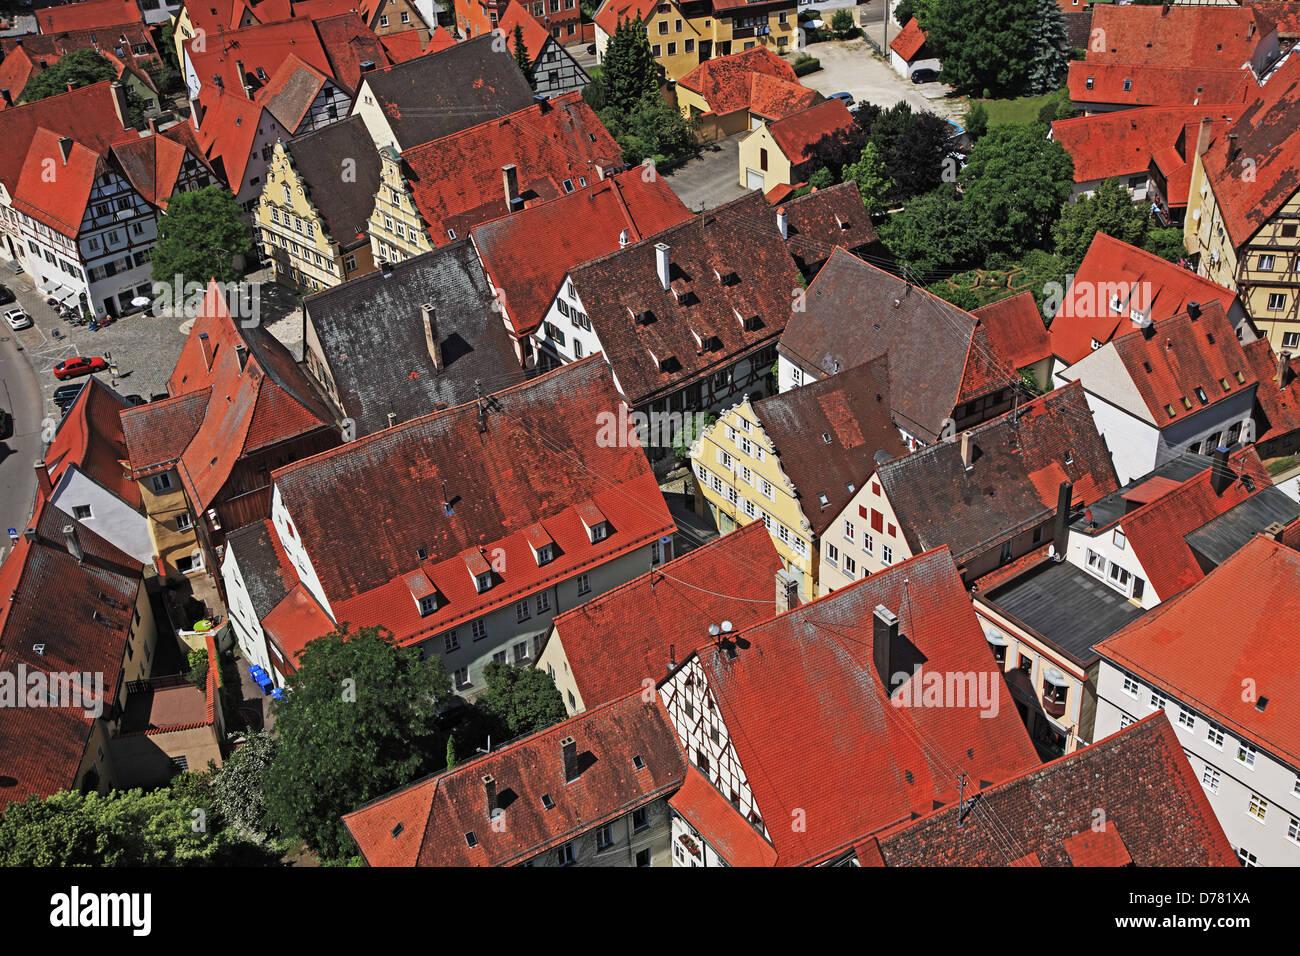 Germany, Bavaria, Romantic Road, Nördlingen - Stock Image